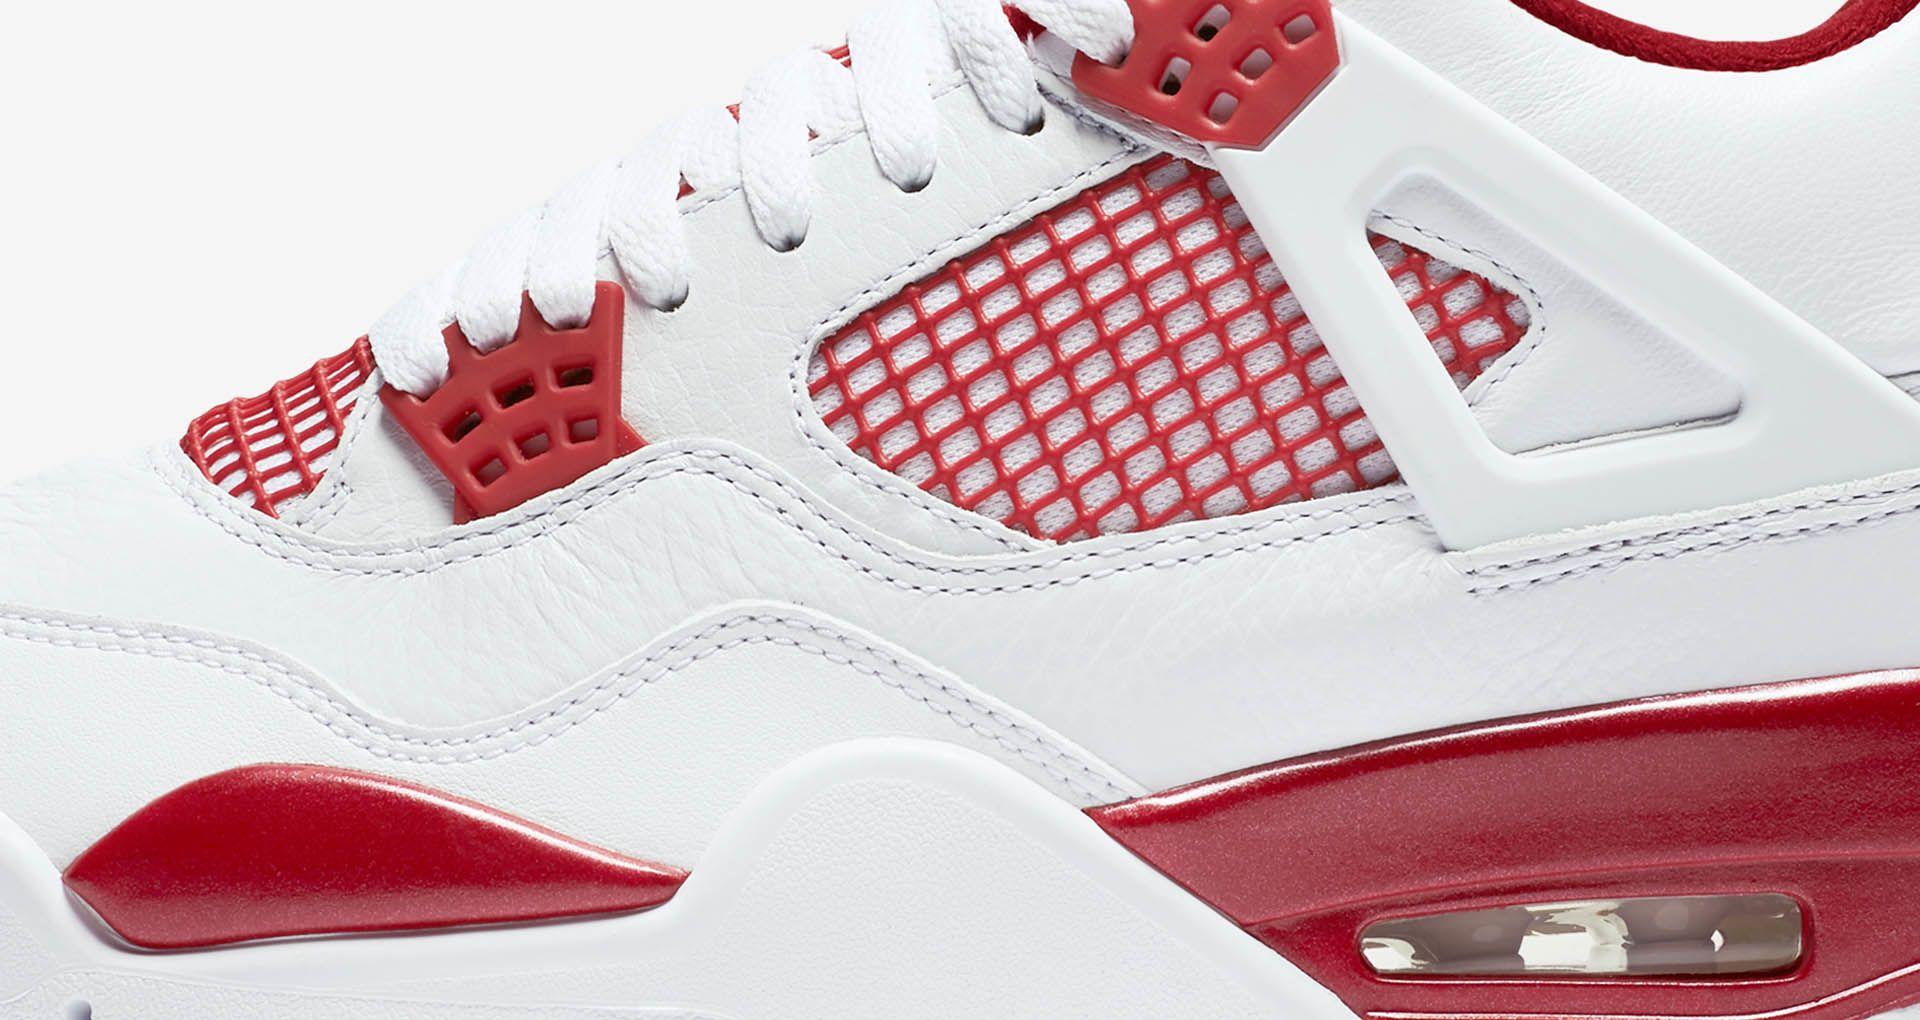 quality design f0a3f 5cfb4 Air Jordan 4 Retro 'Alternate 89' Release Date. Nike+ SNKRS